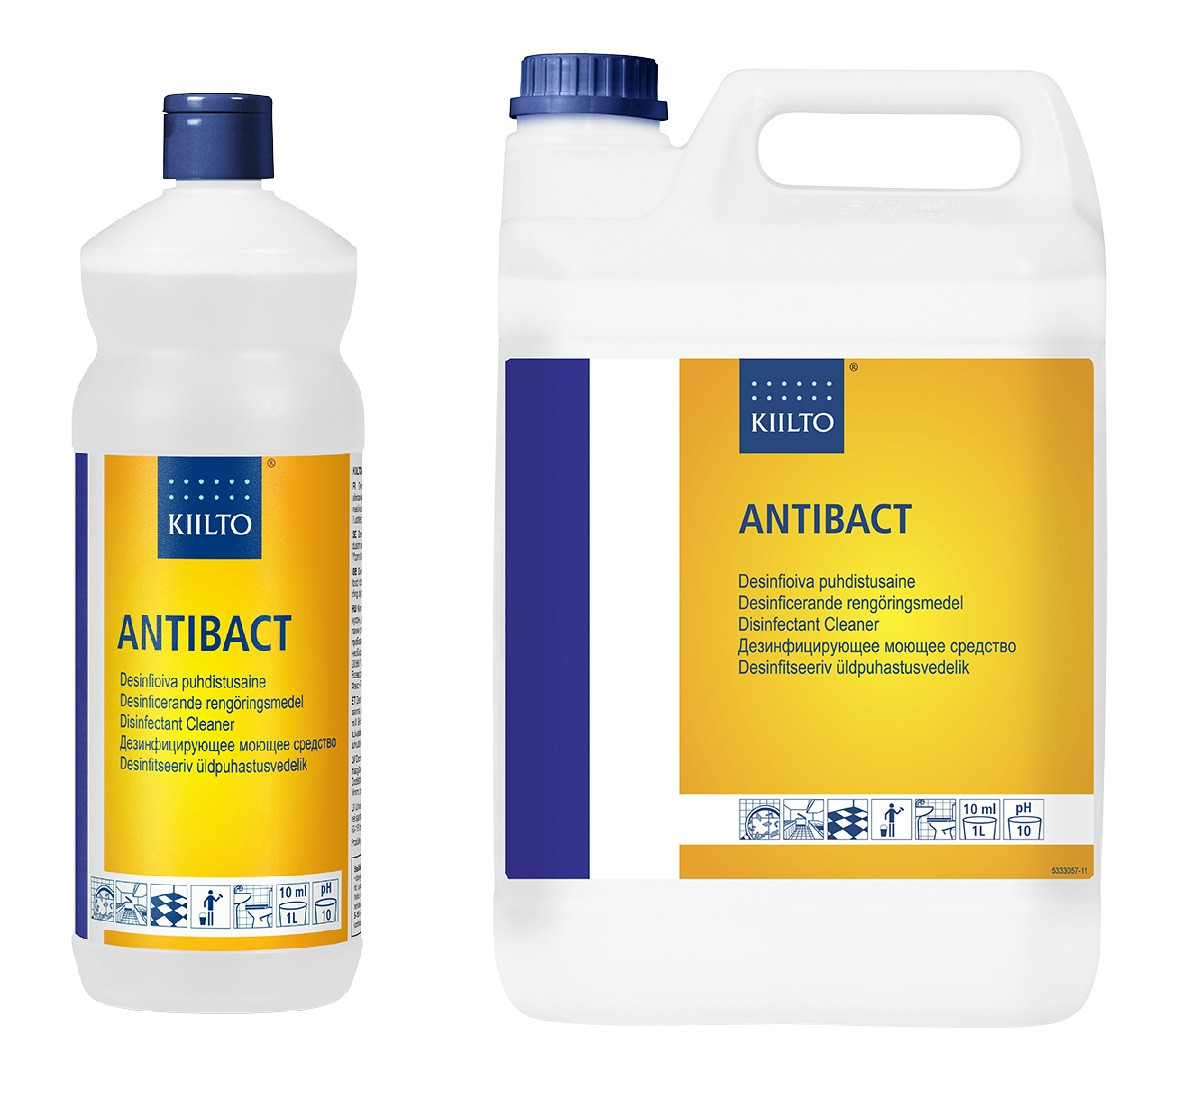 Kiilto Antibact